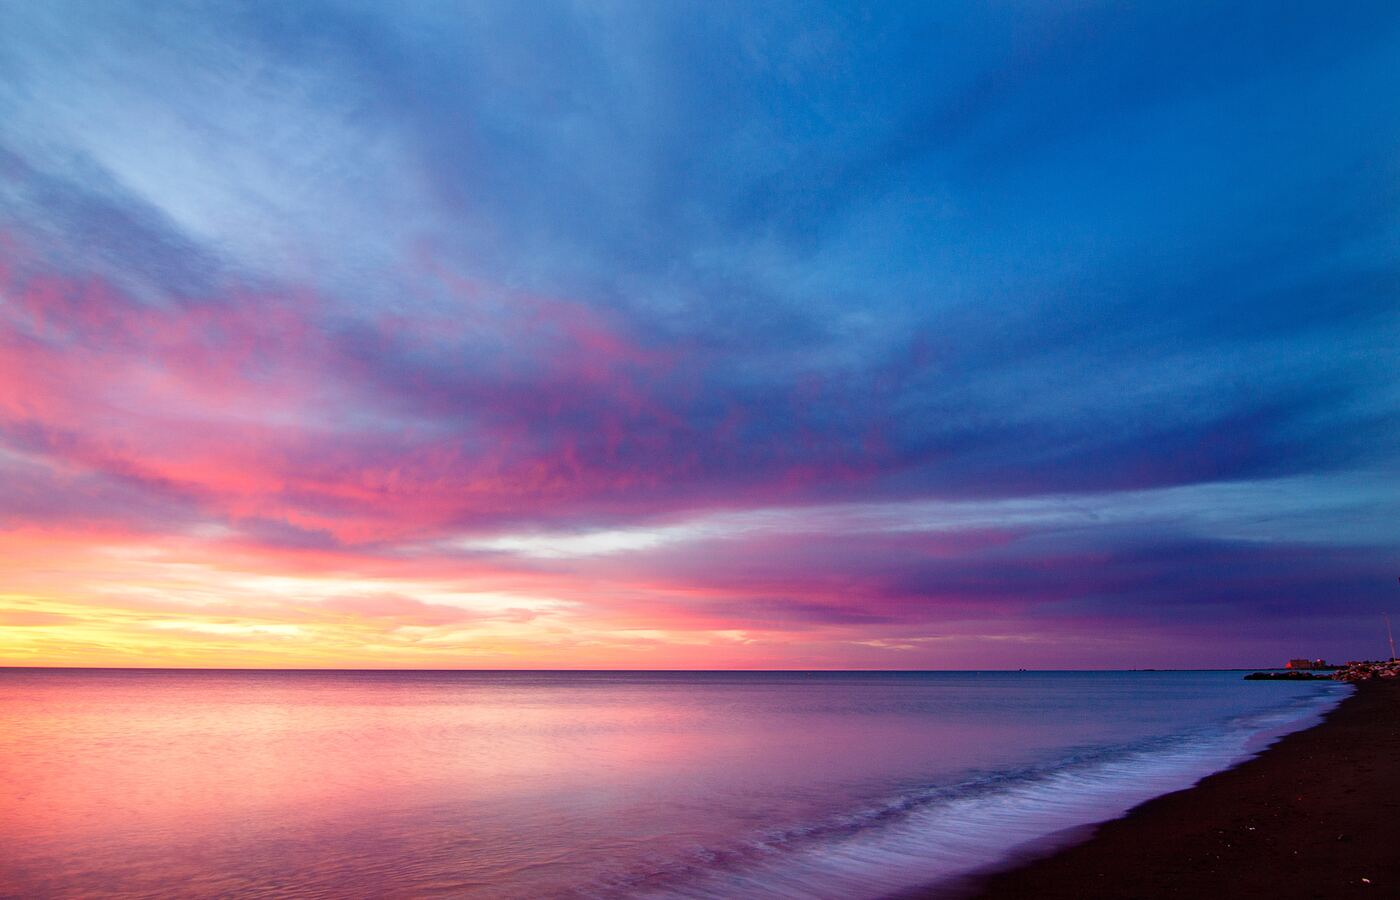 sea-line-purple-sky-5k-o0.jpg